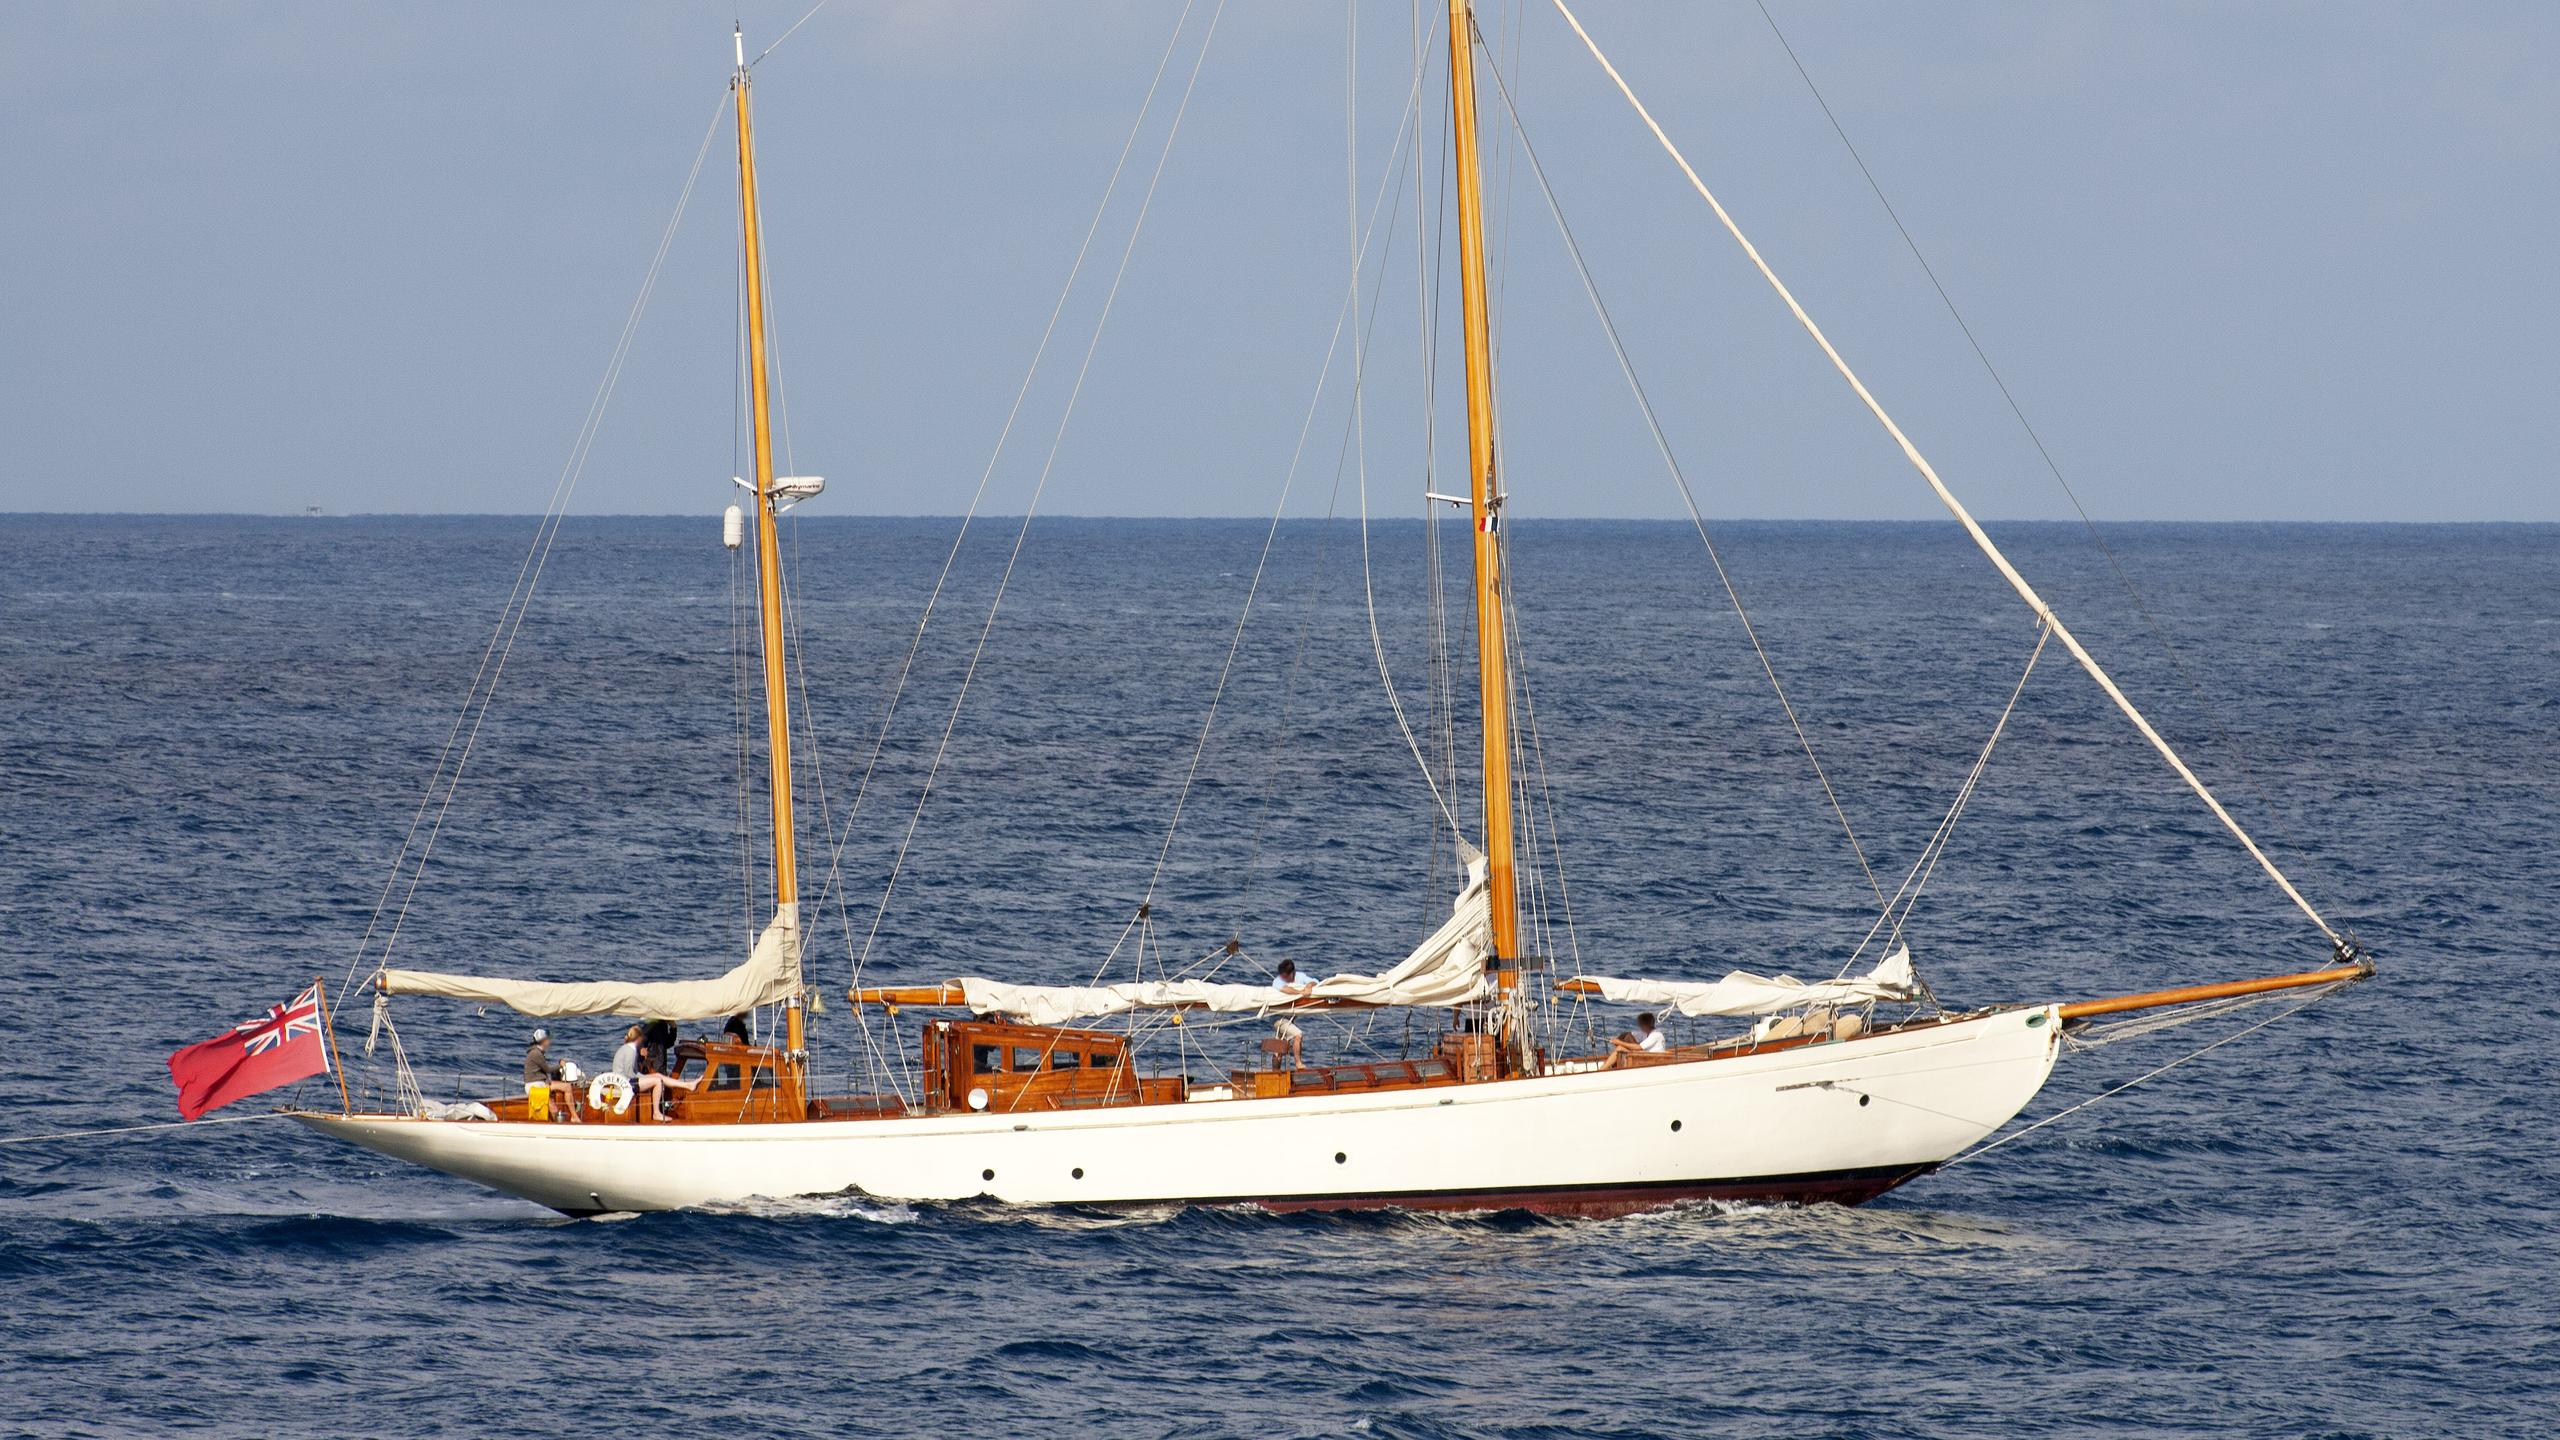 berenice-sailing-yacht-j-samuel-white-1923-28m-profile